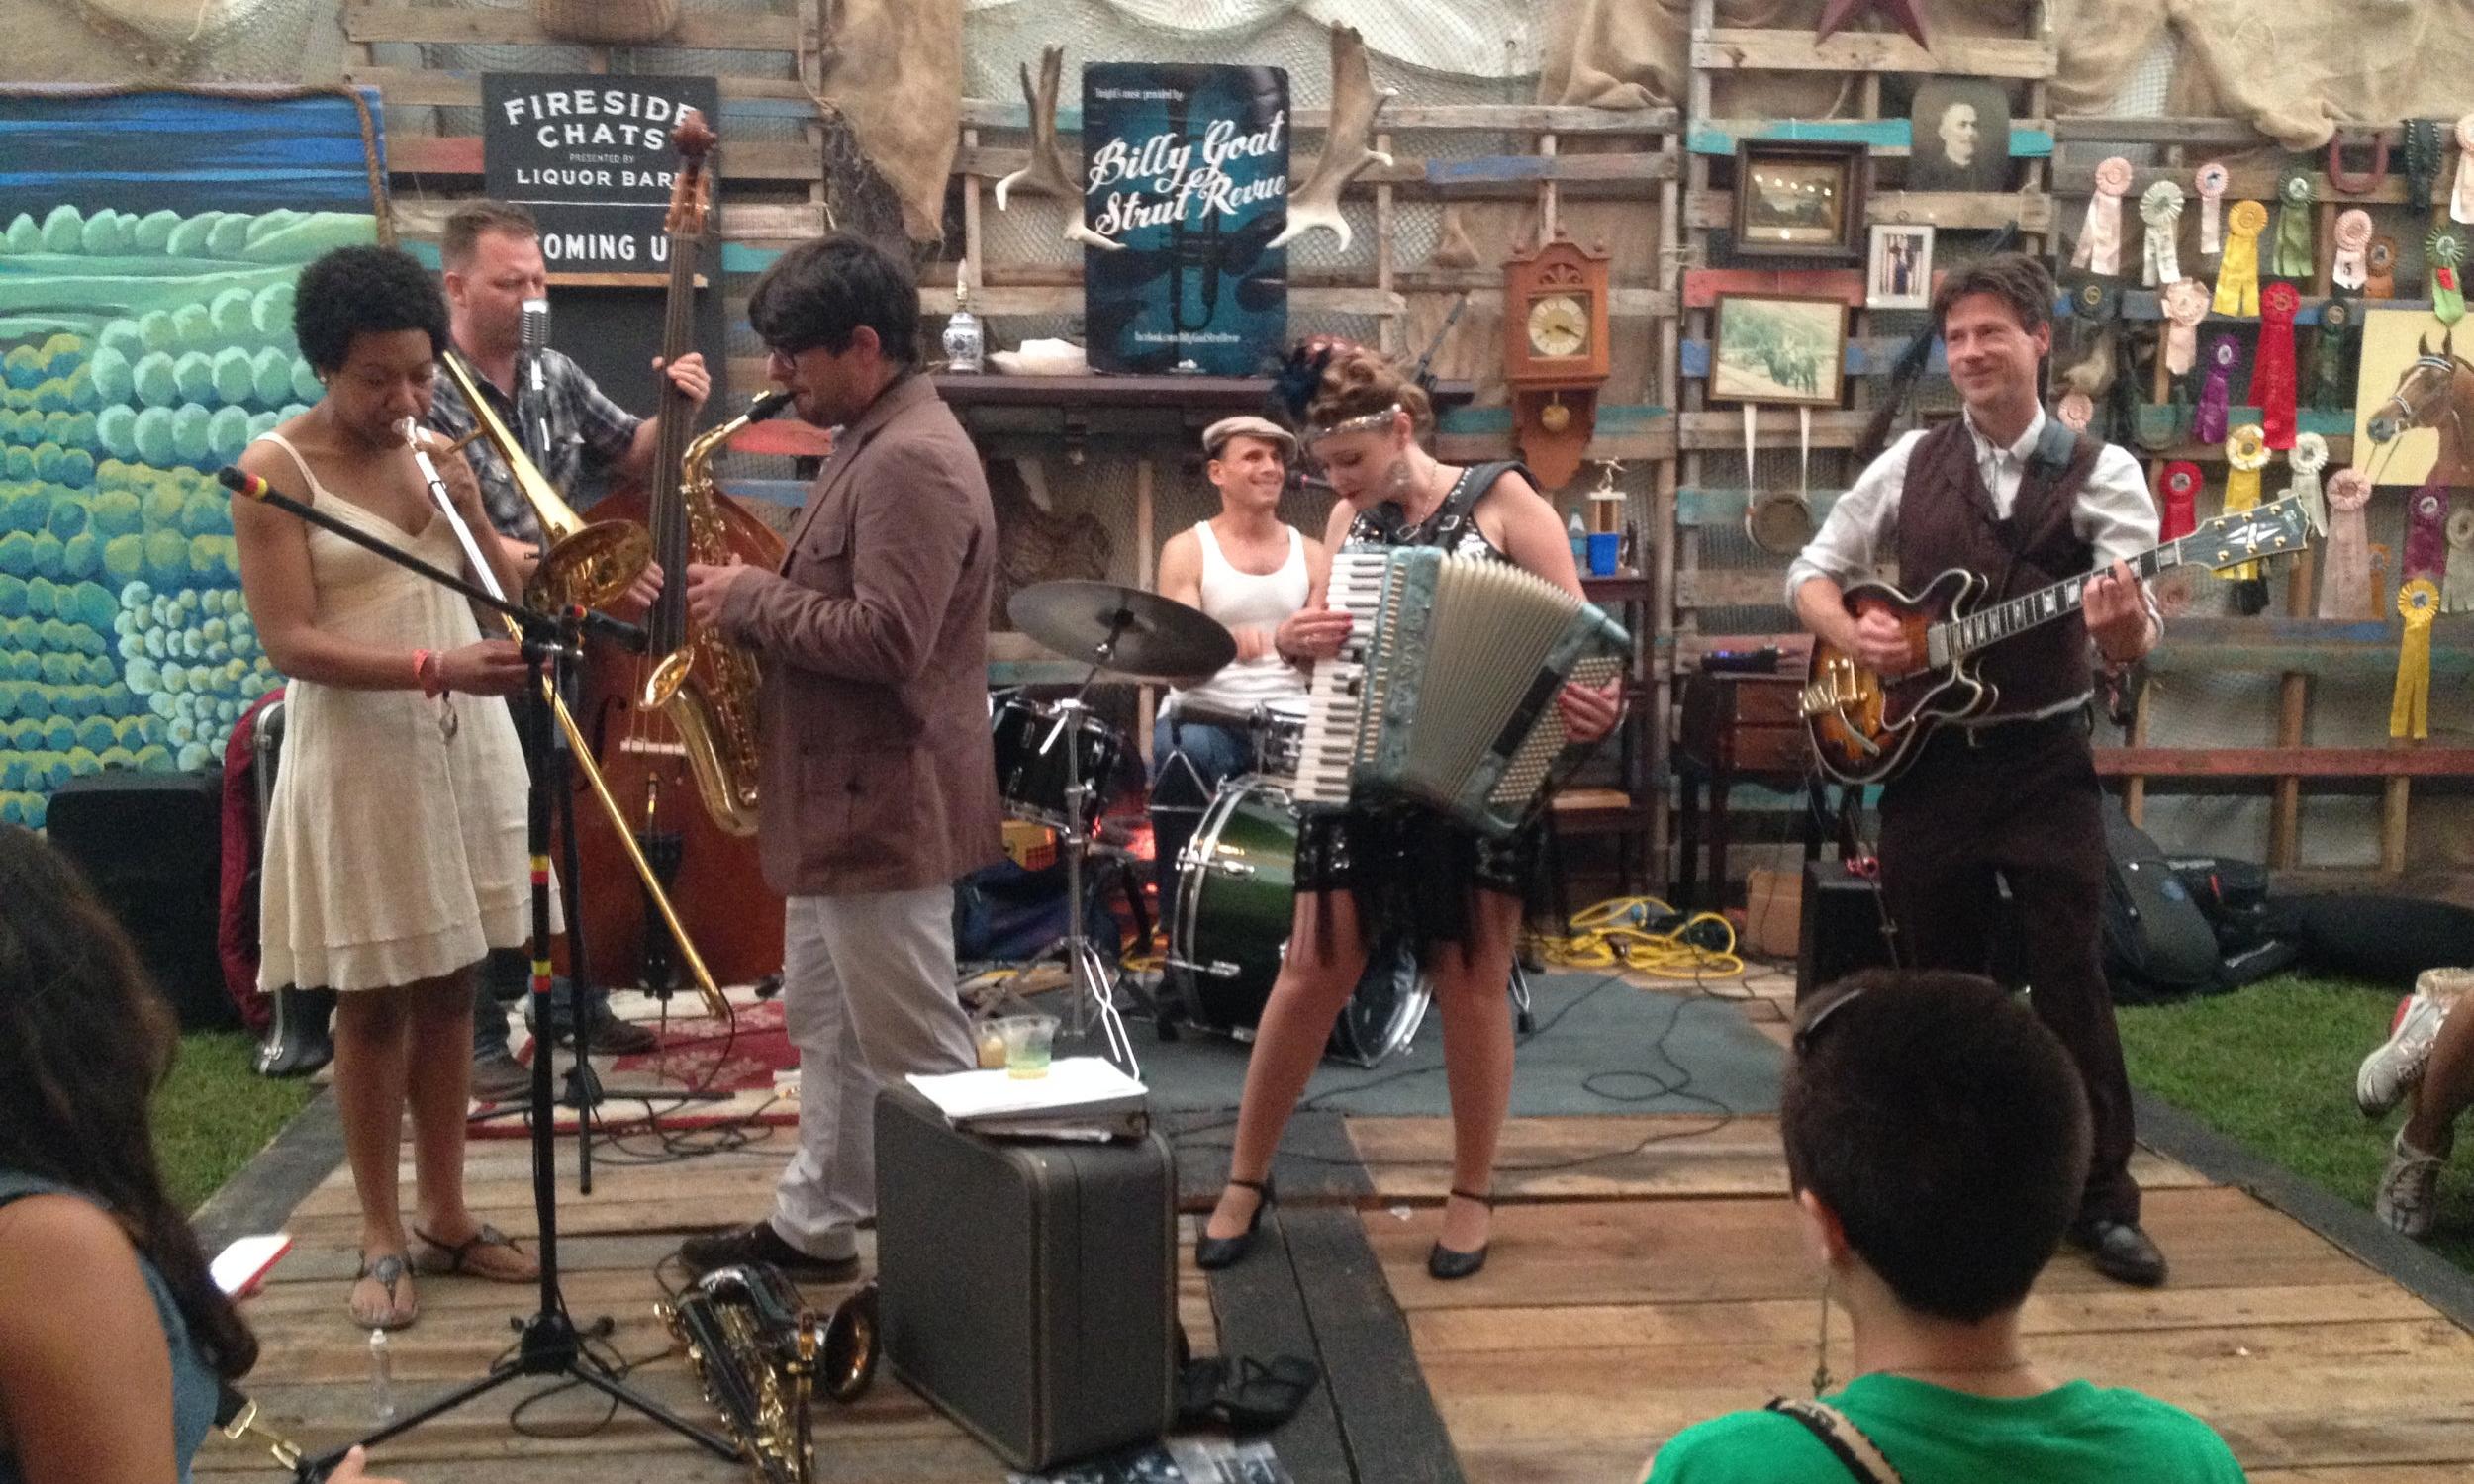 Band: Billy Goat Strut Revue.